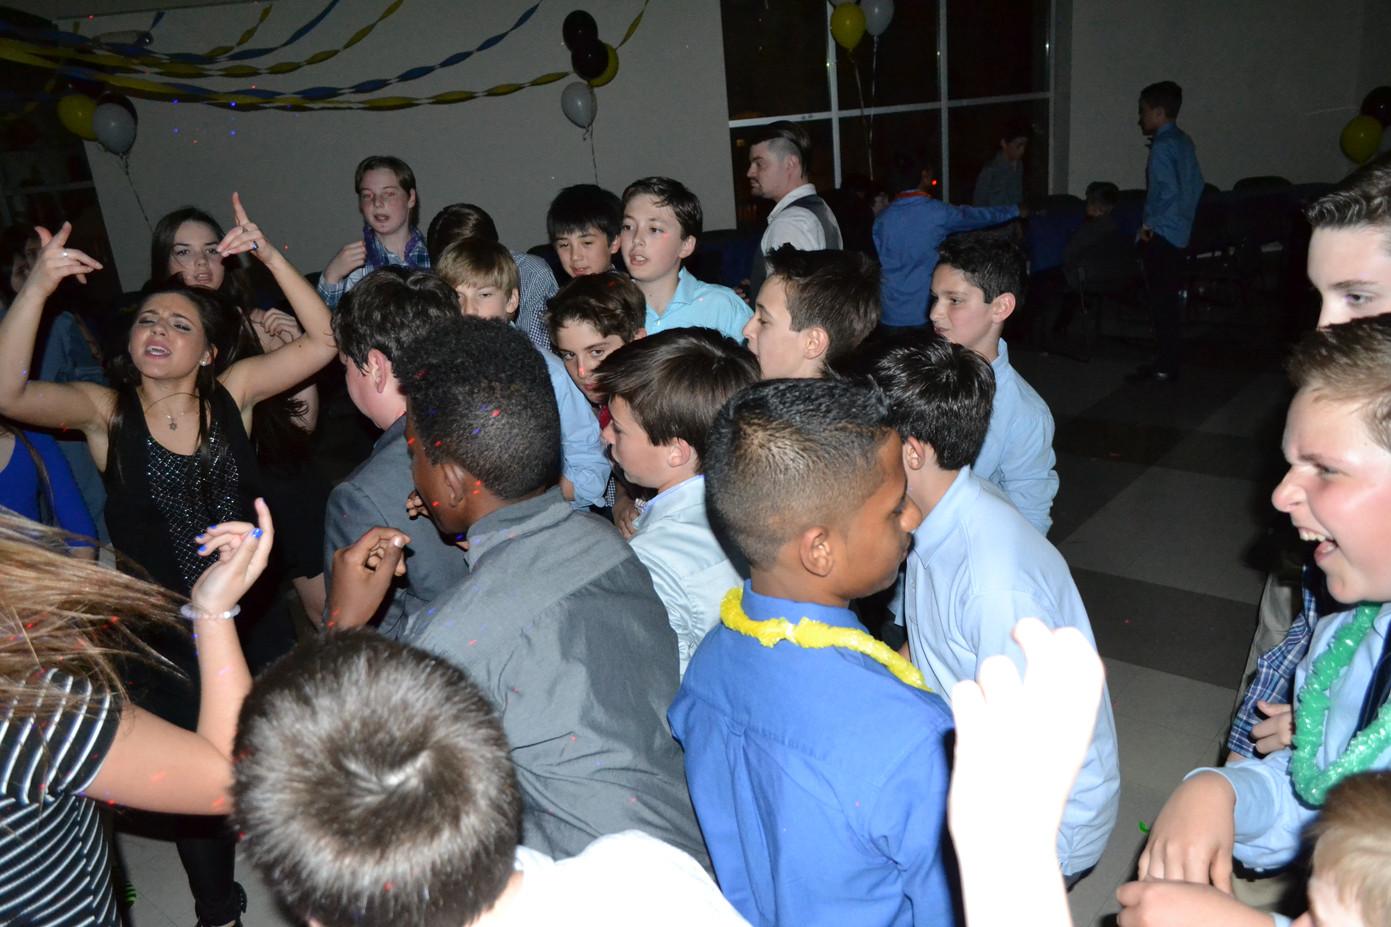 Teens-Party-Guest.JPG